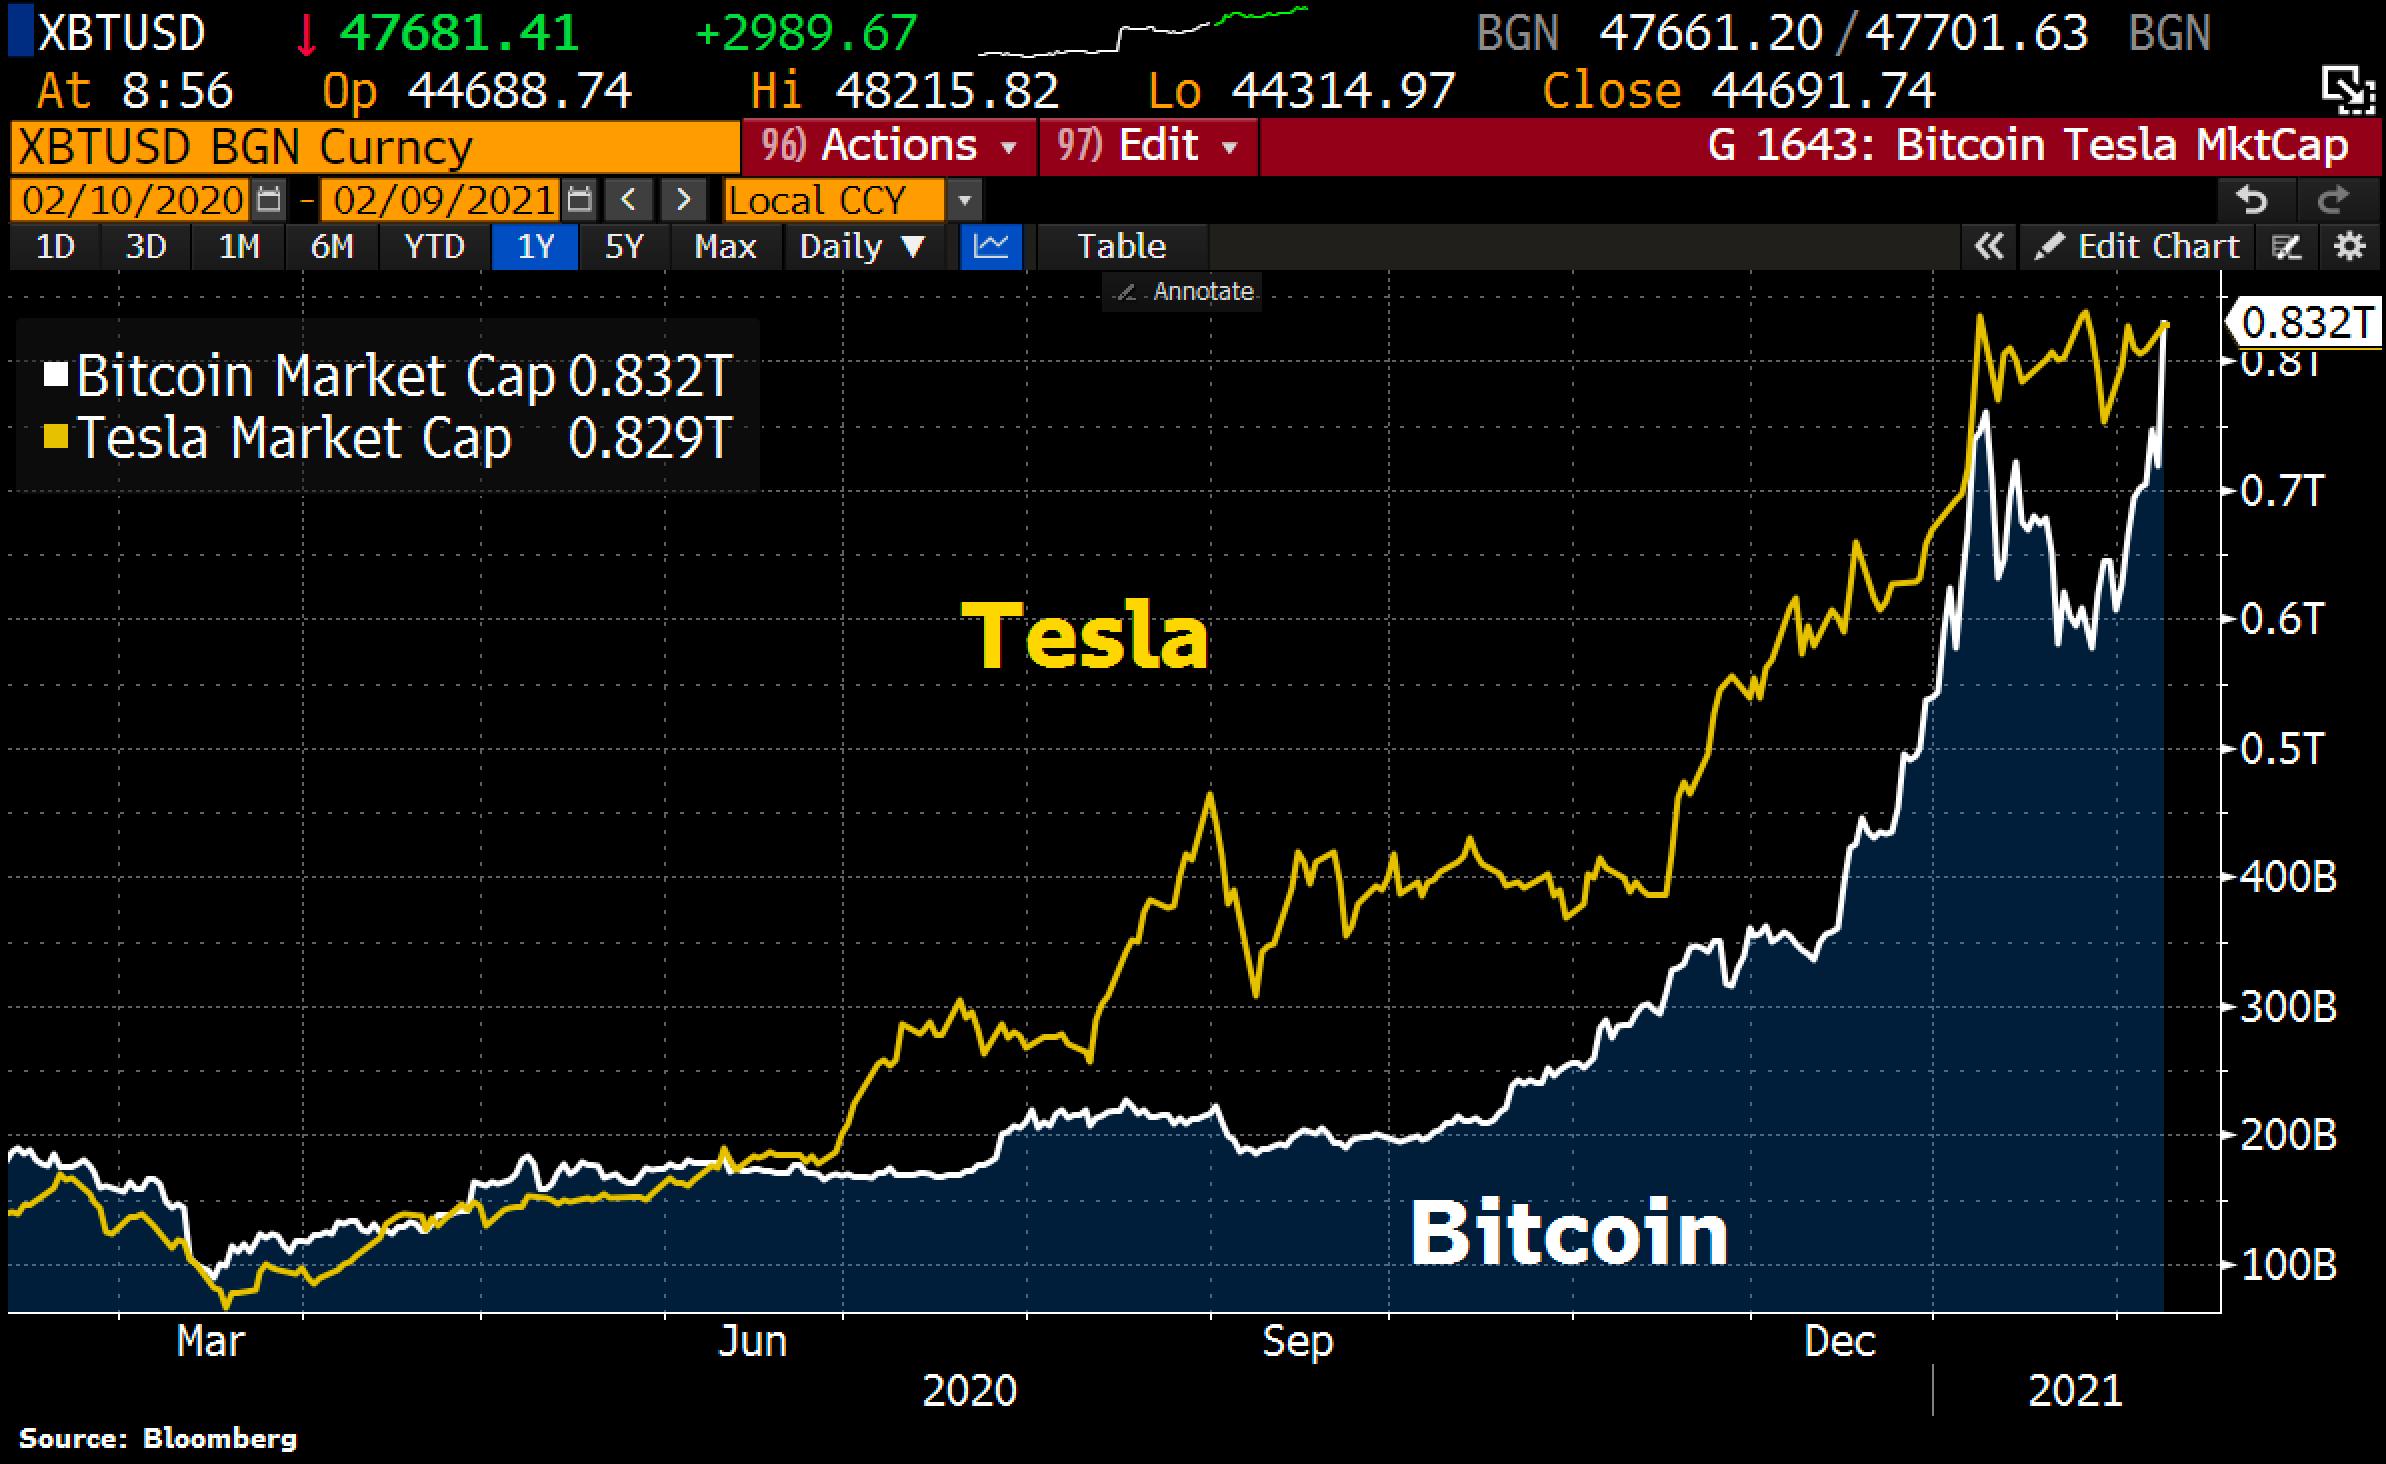 Perspective: Bitcoin has overtaken Tesla in terms of market value